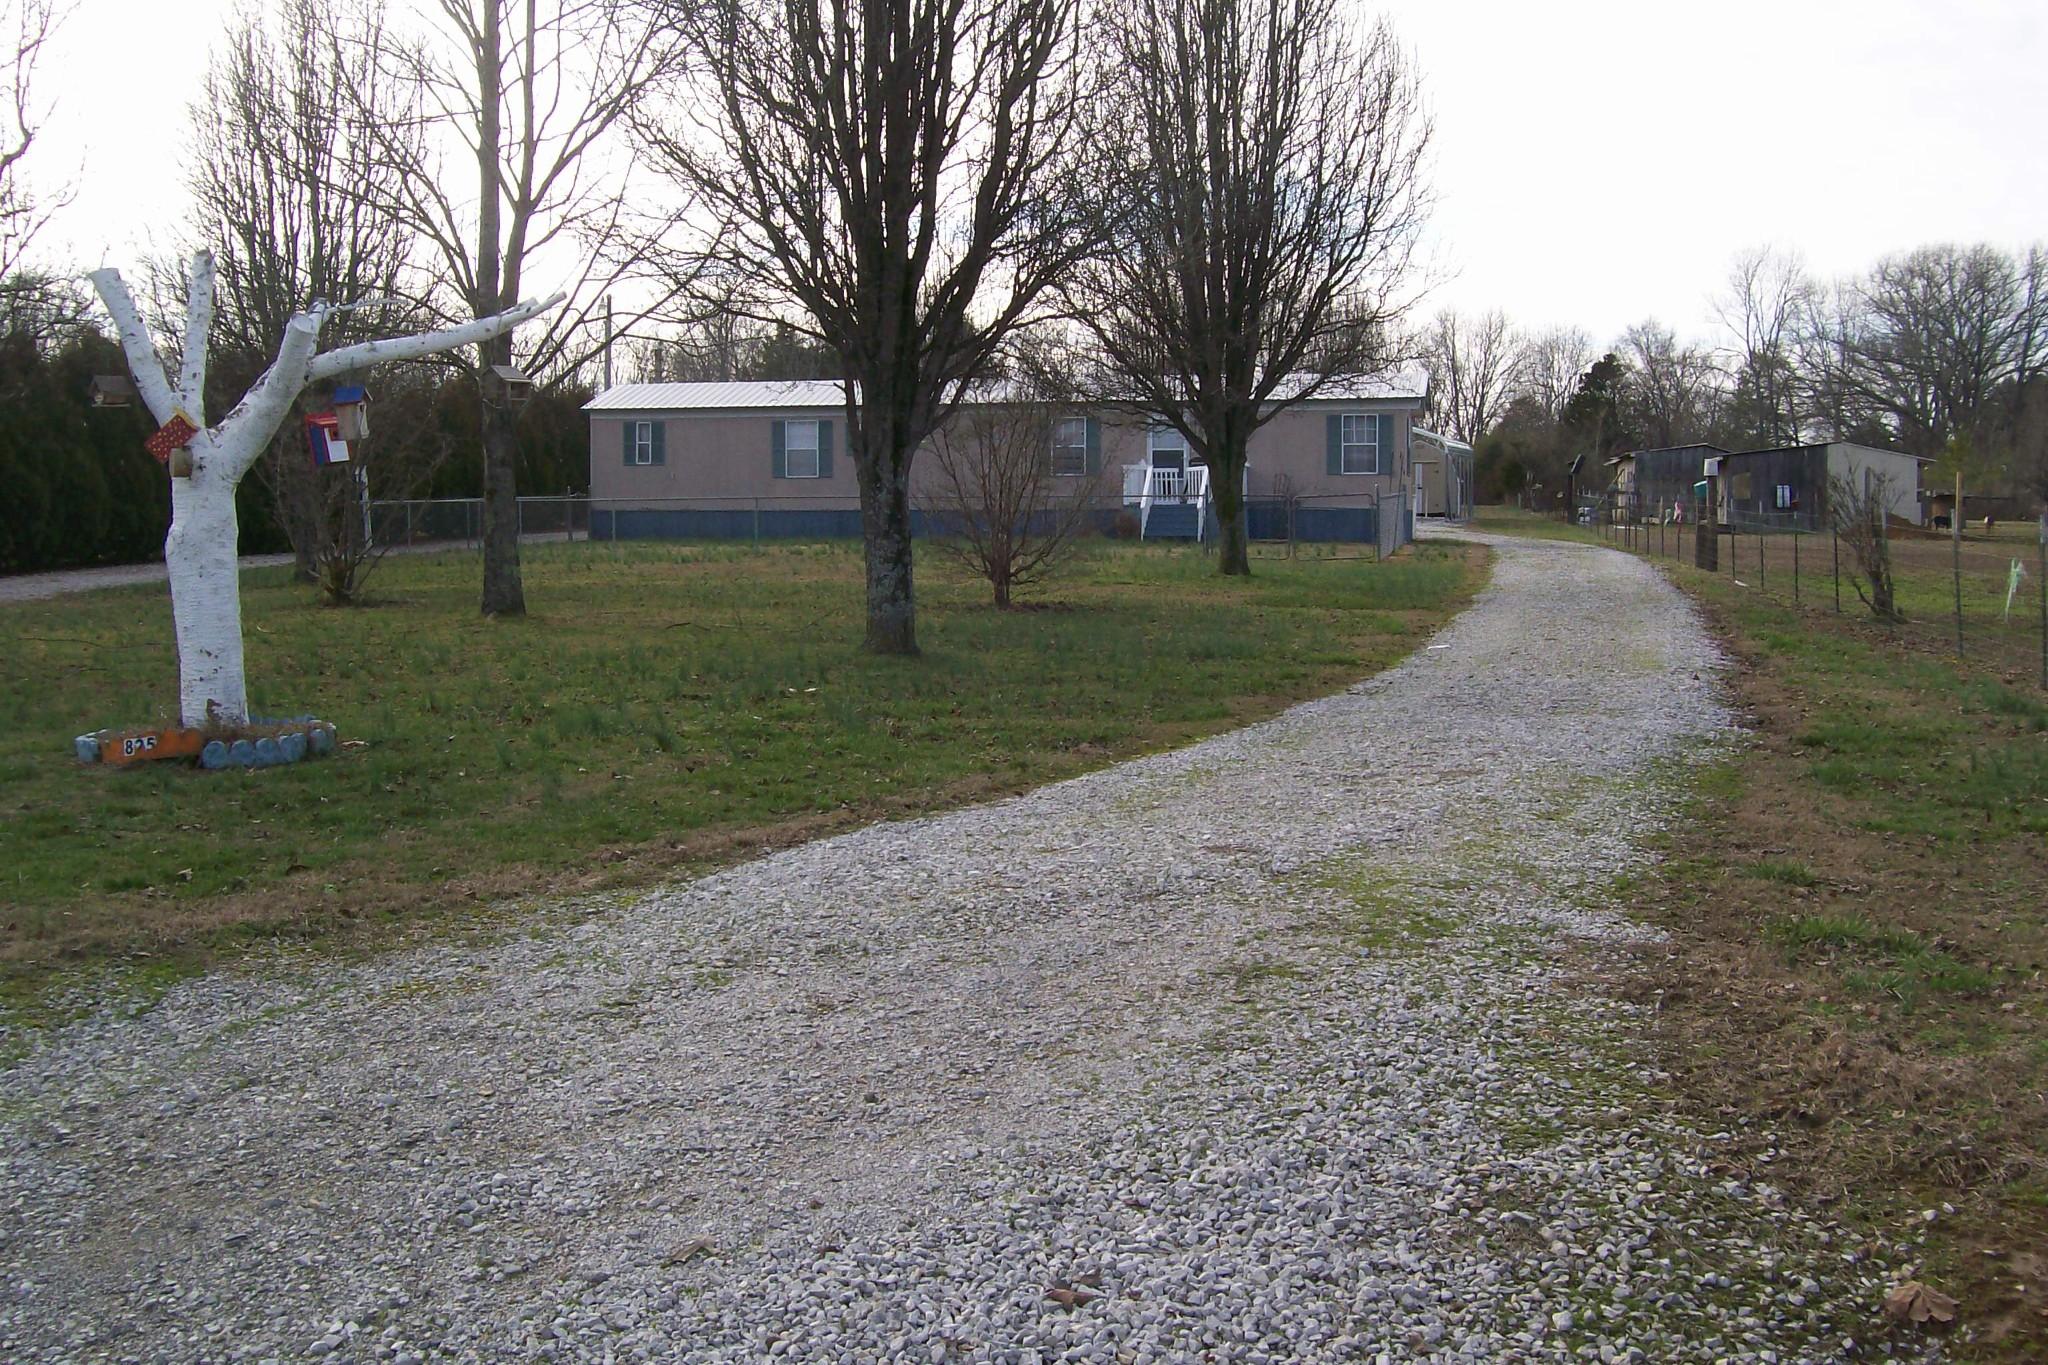 825 Francis Ferry Rd, Mc Minnville, TN 37110 - Mc Minnville, TN real estate listing